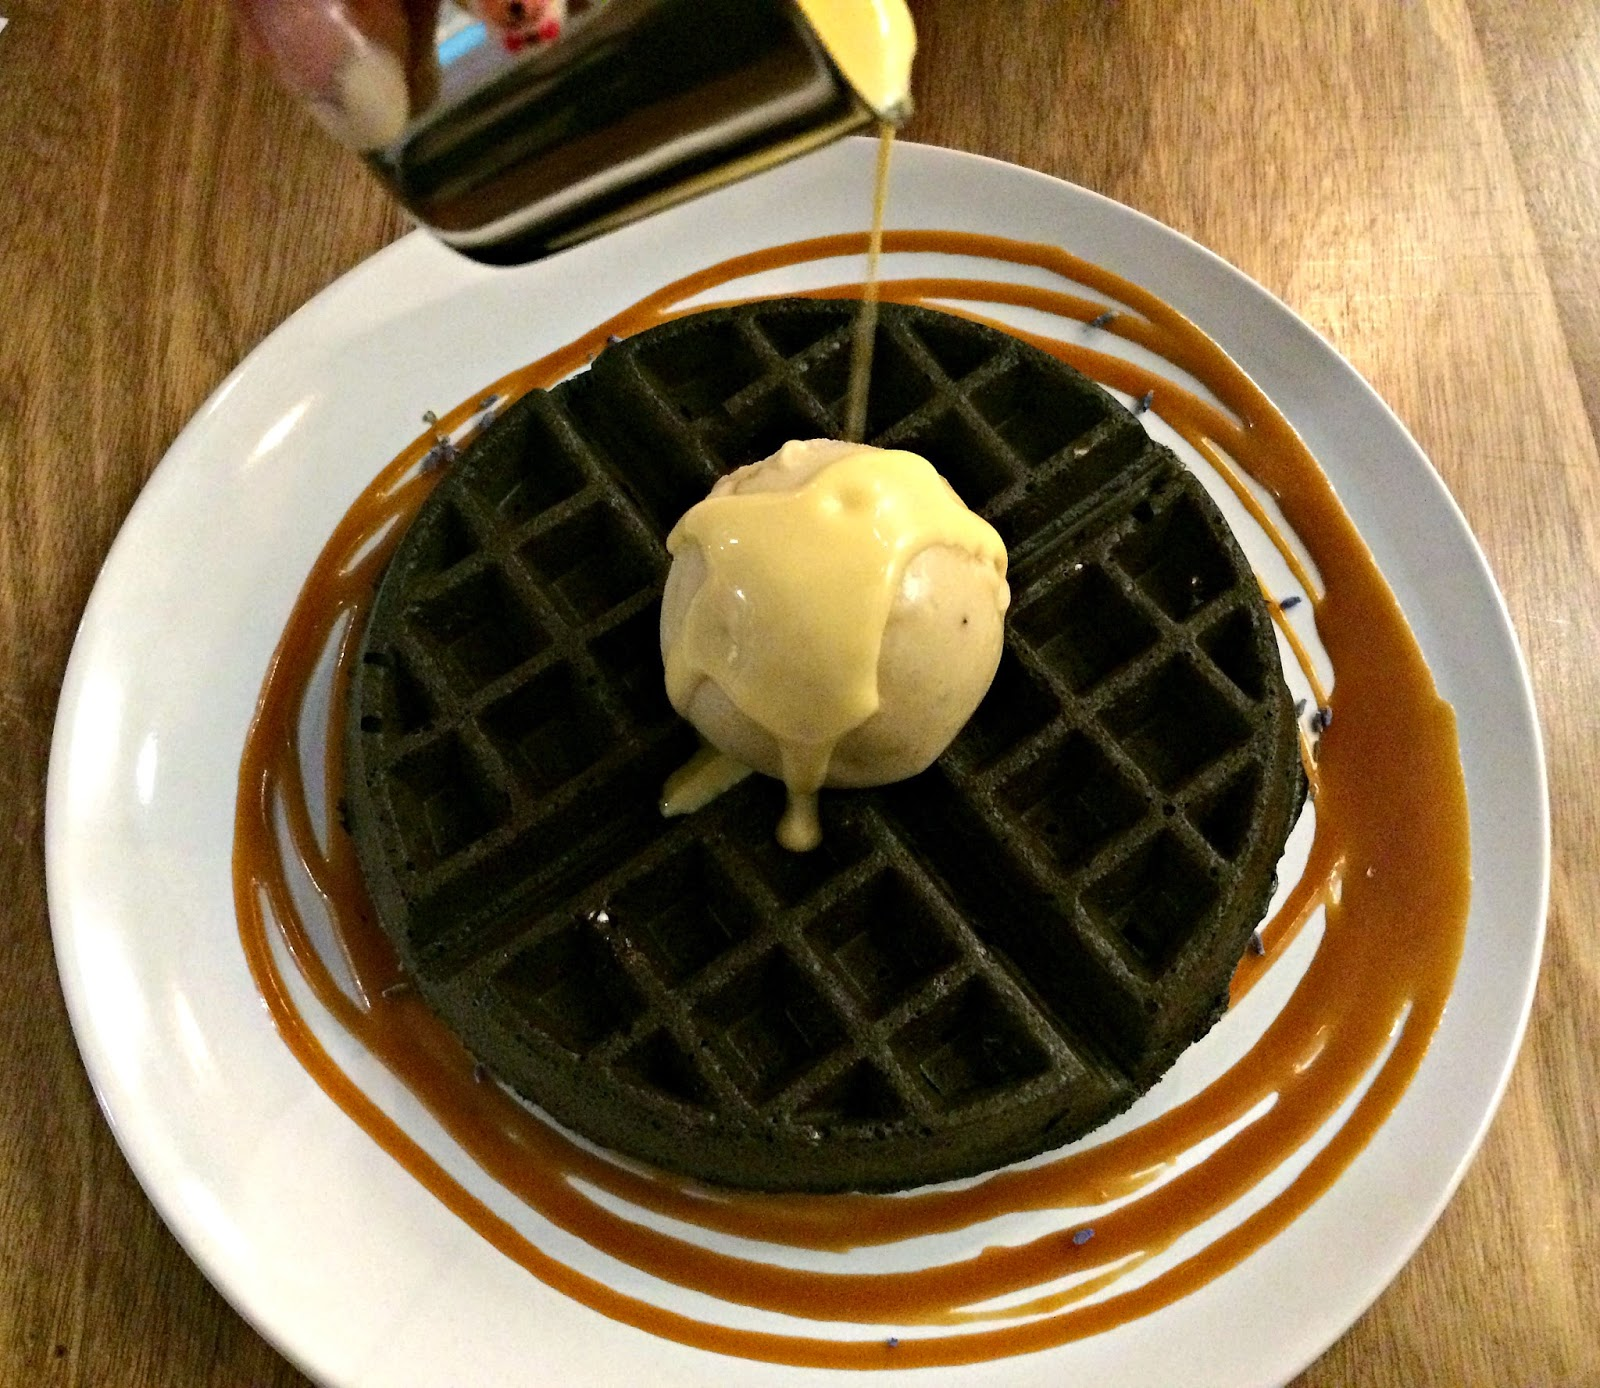 Gourmet Waffles & Banana Caramel Ice Cream